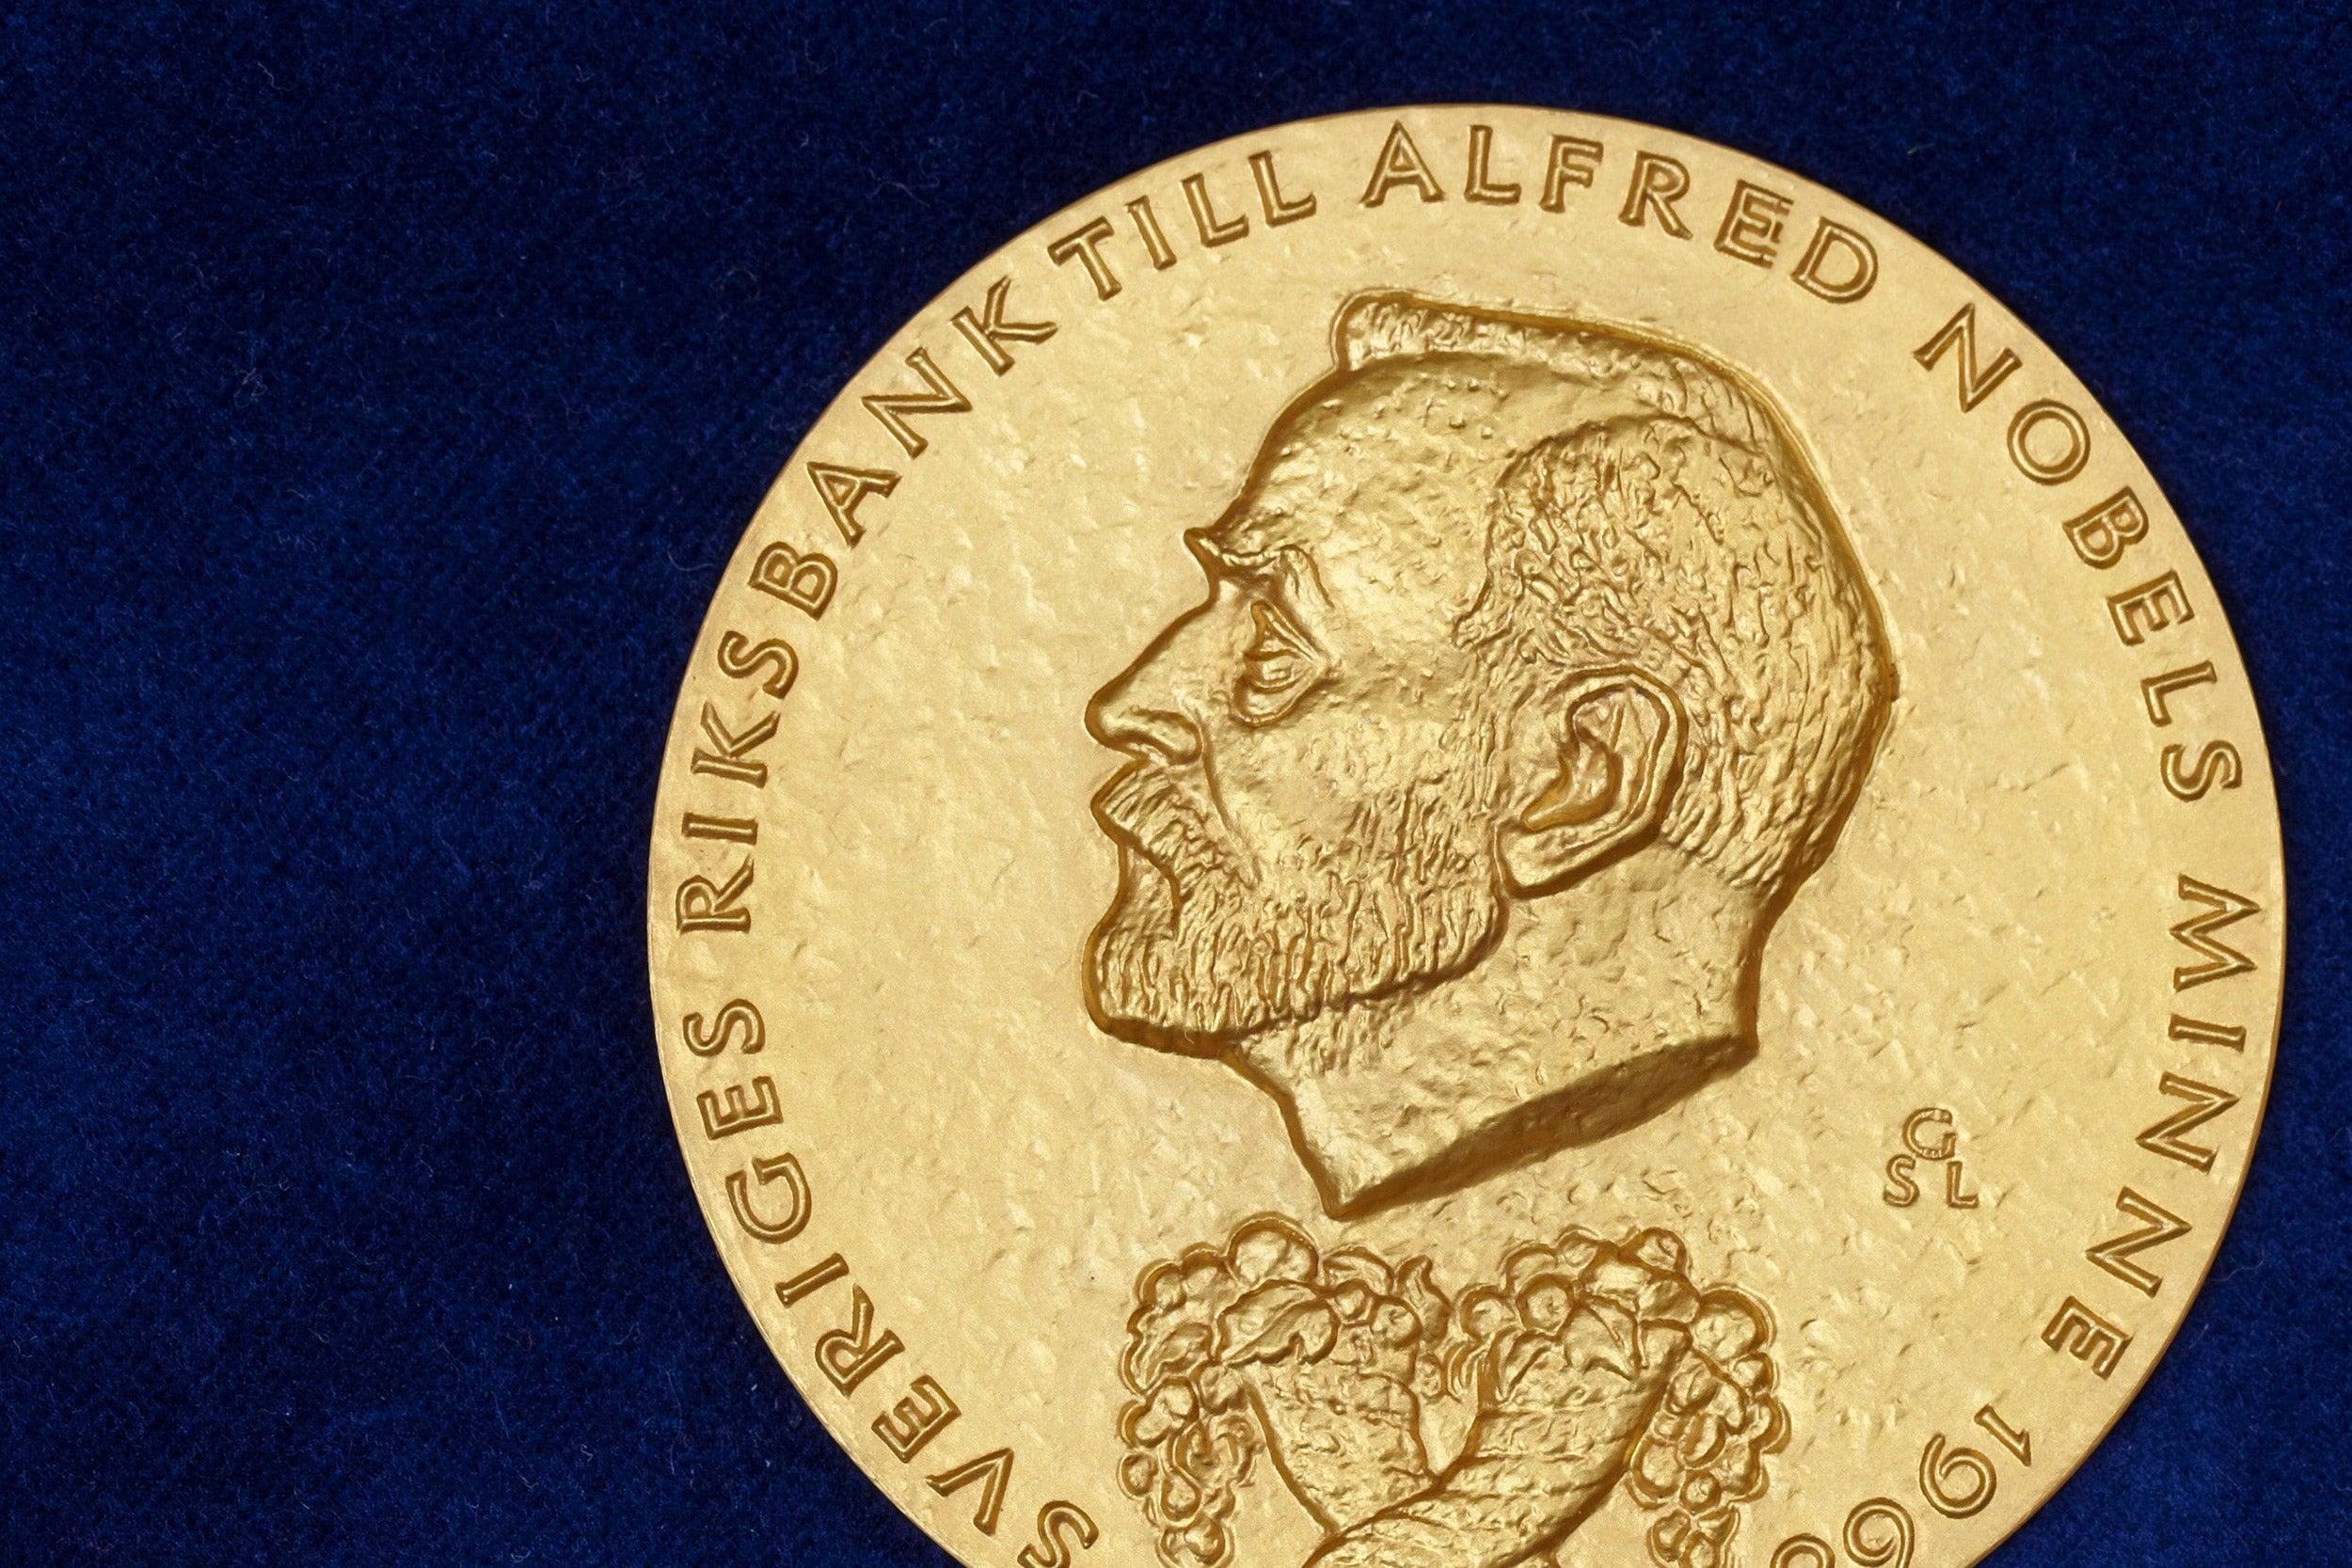 Sveriges Riksbank Prize in Economic Sciences in Memory of Alfred Nobel